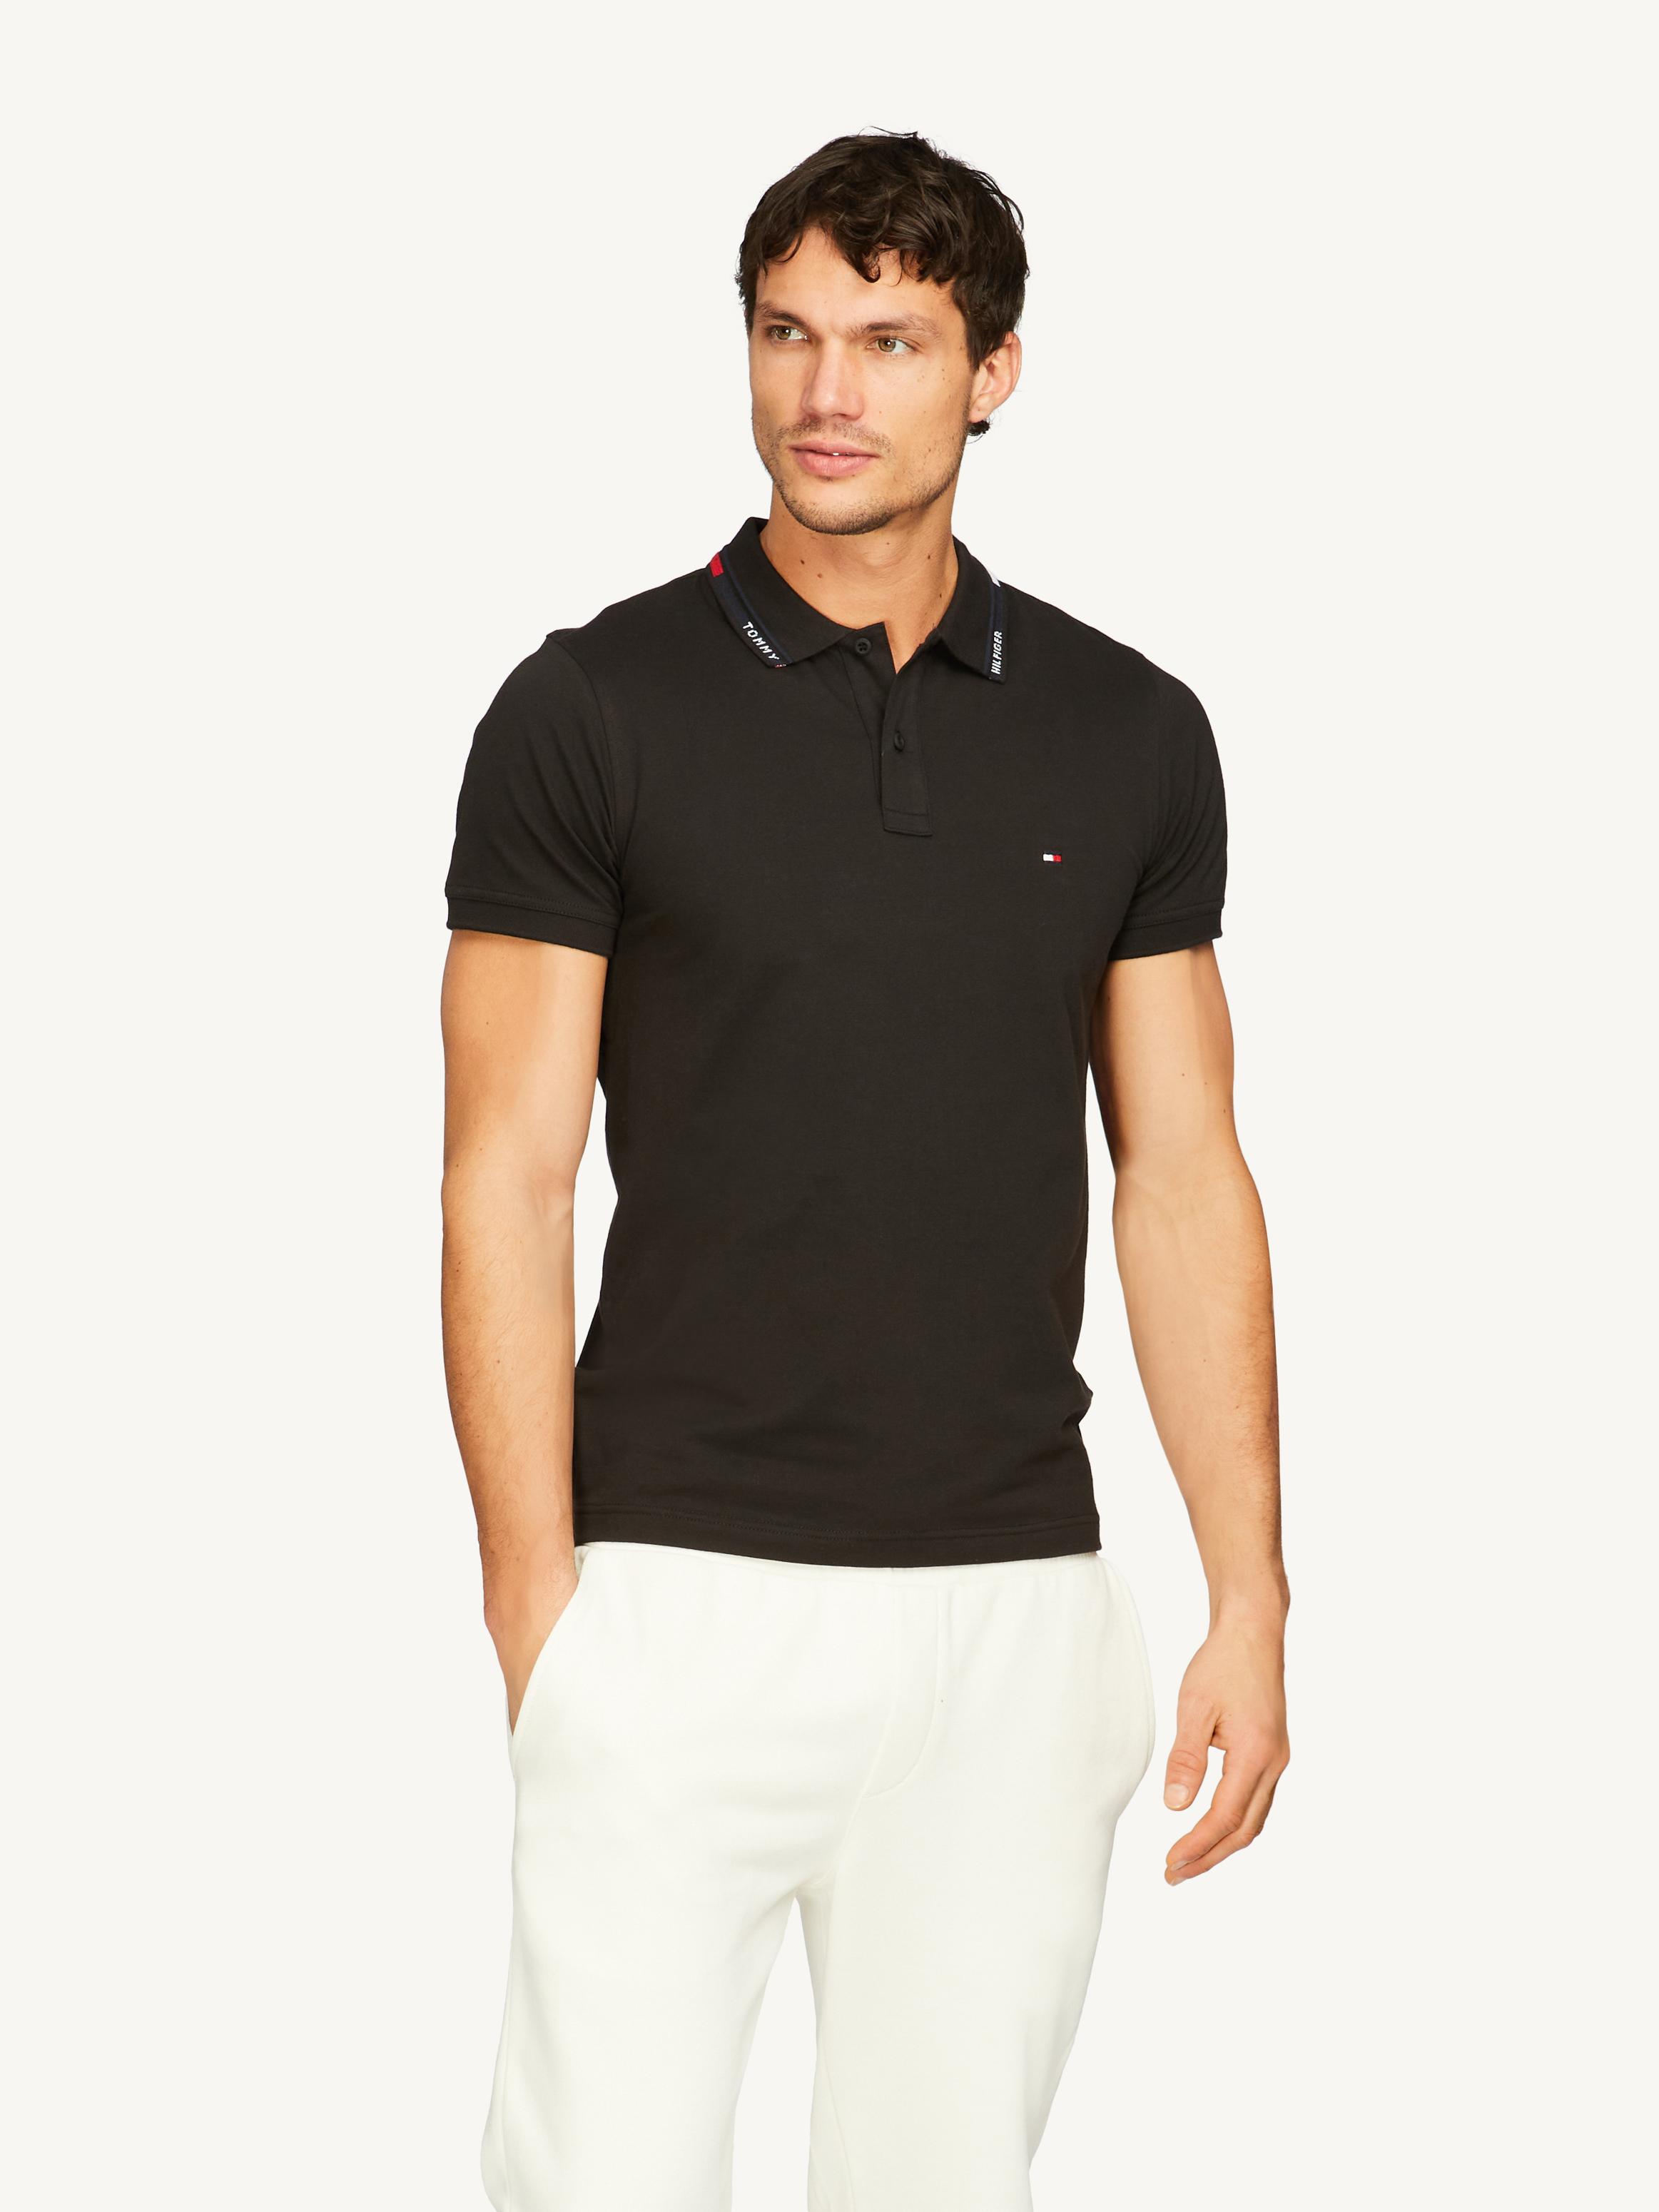 Mens Polo Shirts | Buy Mens Polo Shirts Online | Tommy Hilfiger ...